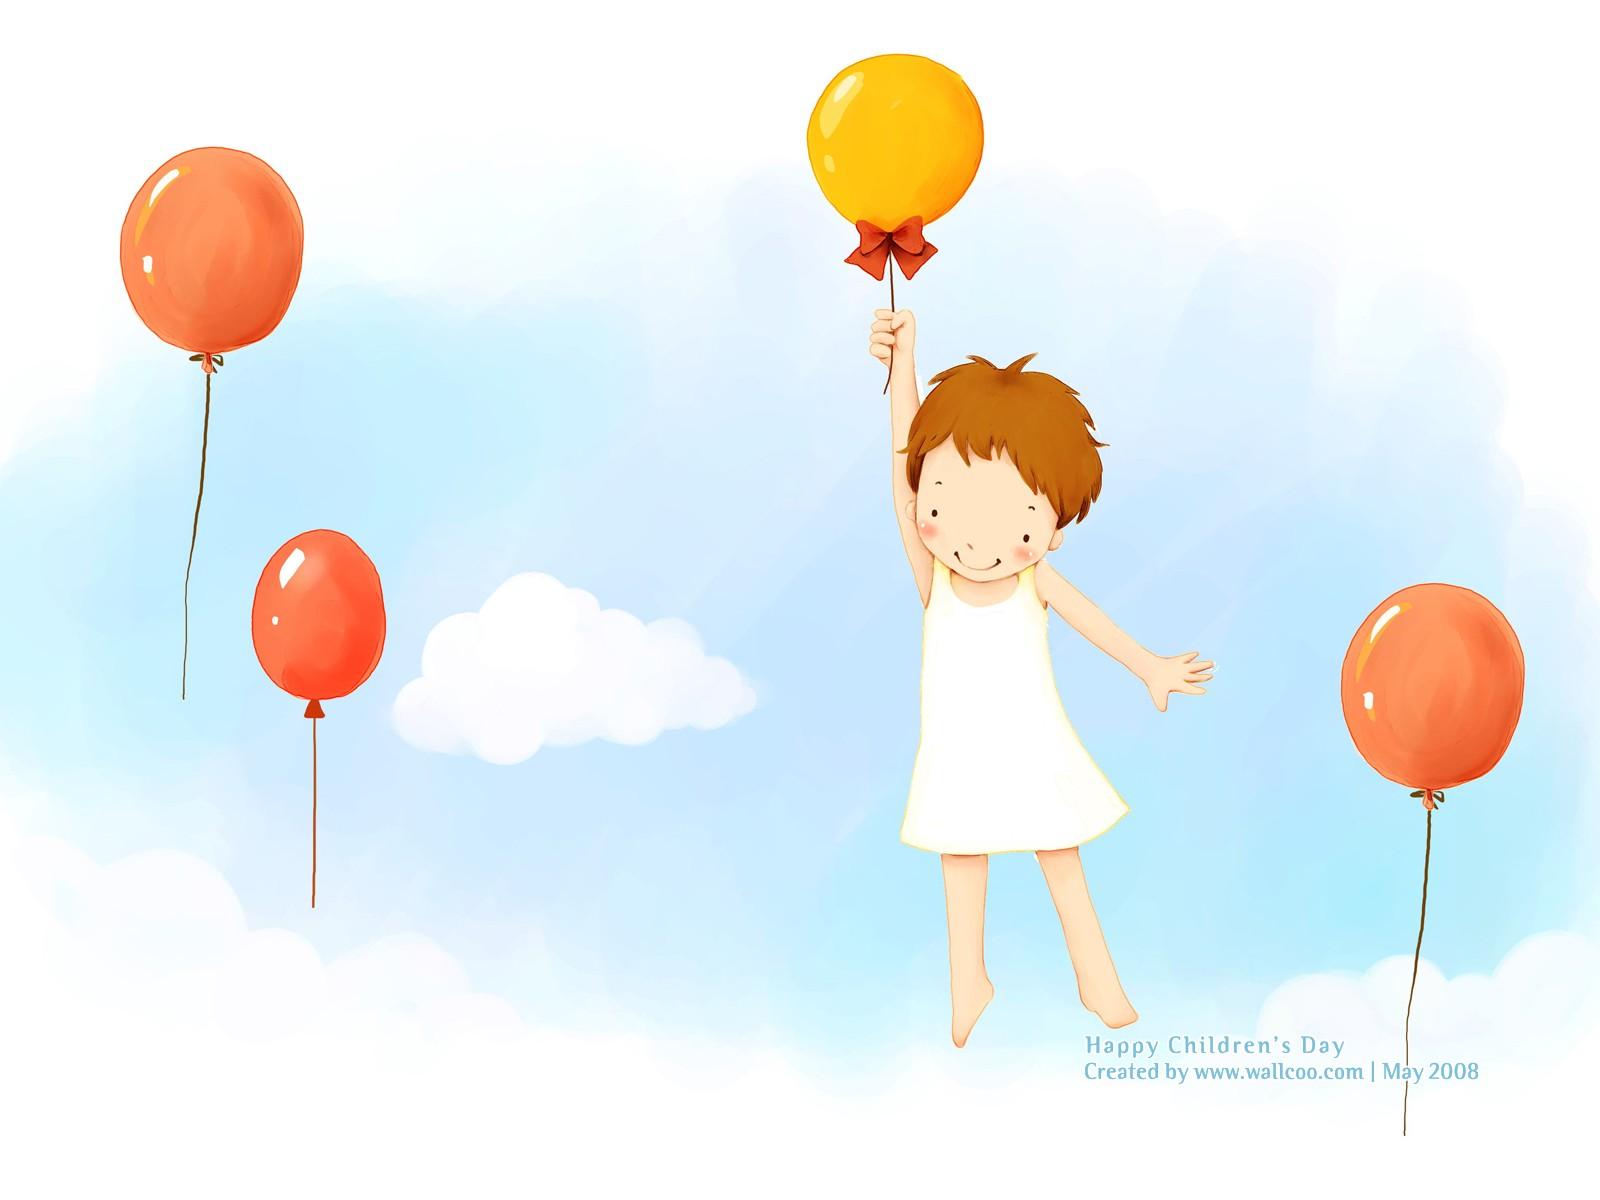 childrens day art wallpaper - photo #15